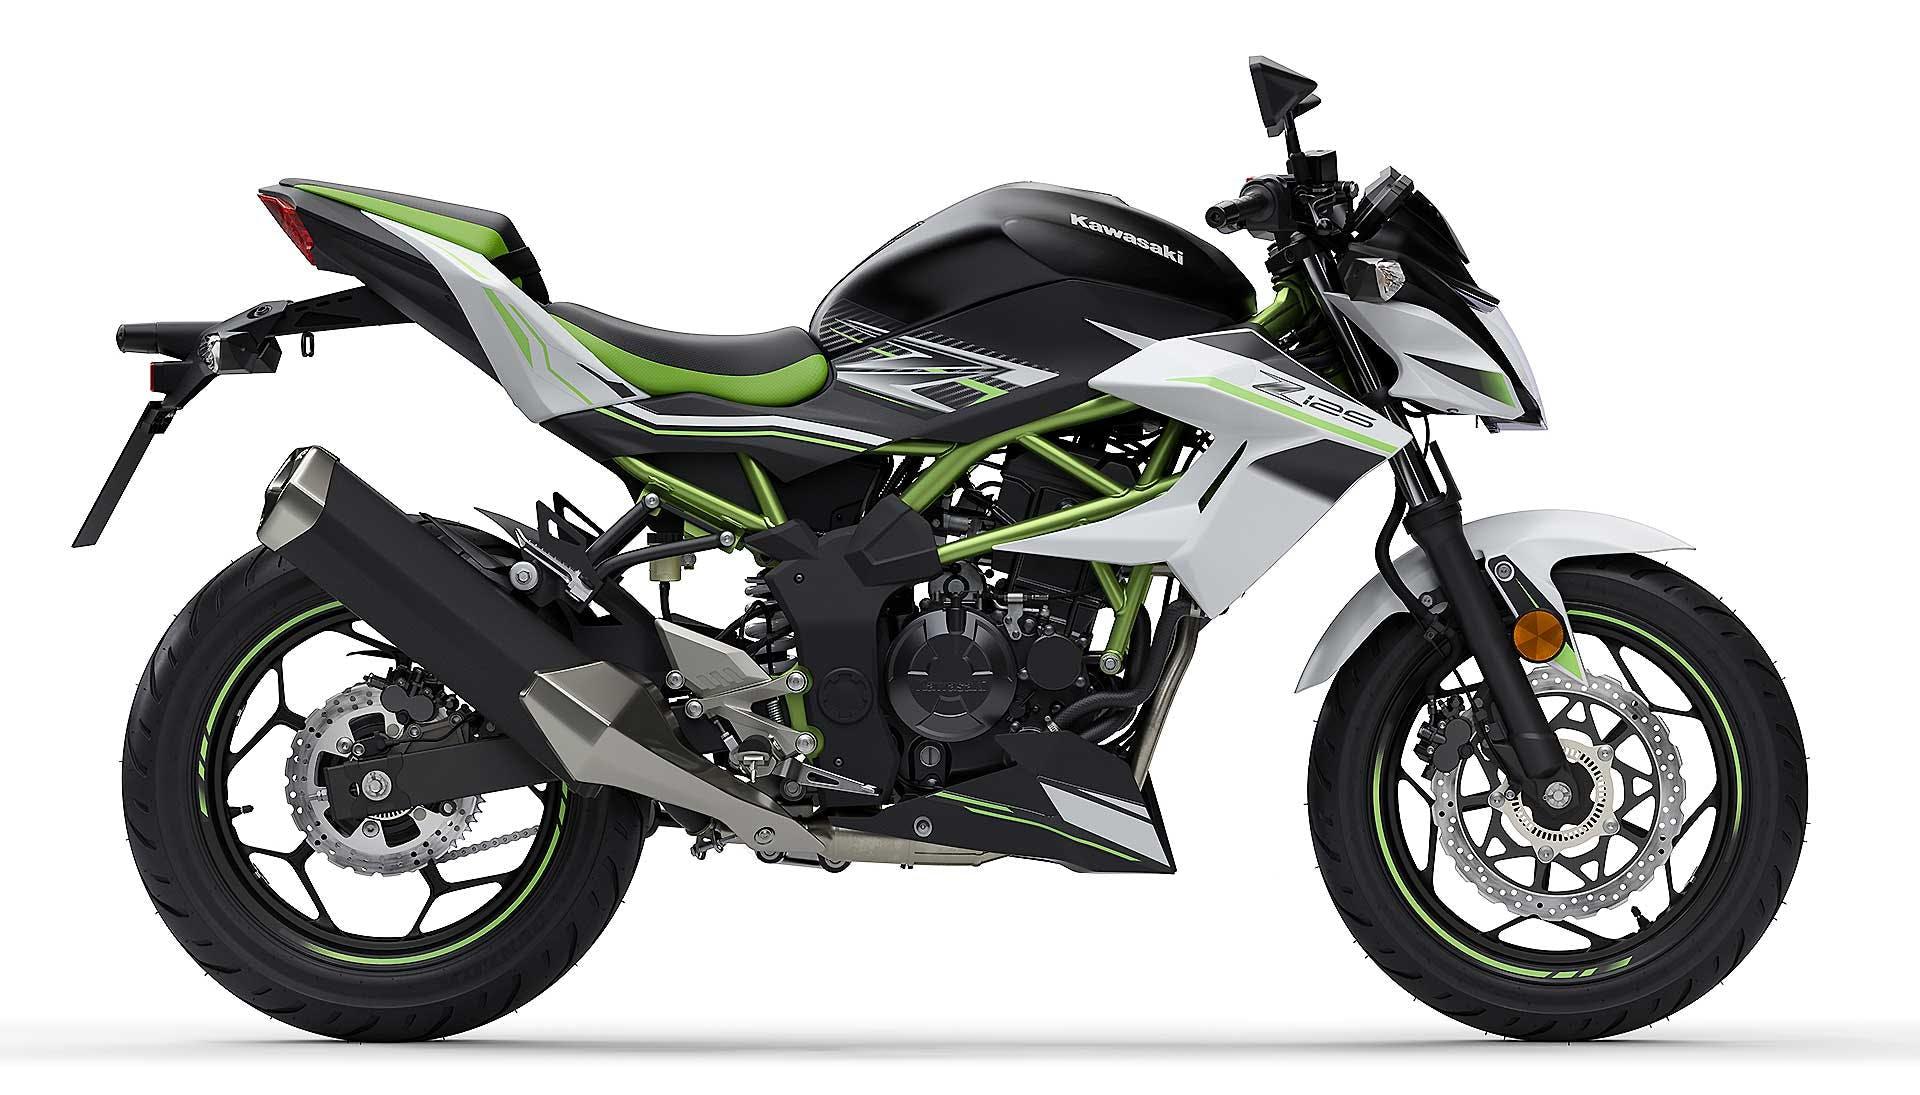 Kawasaki Z 125 Migliori moto 125